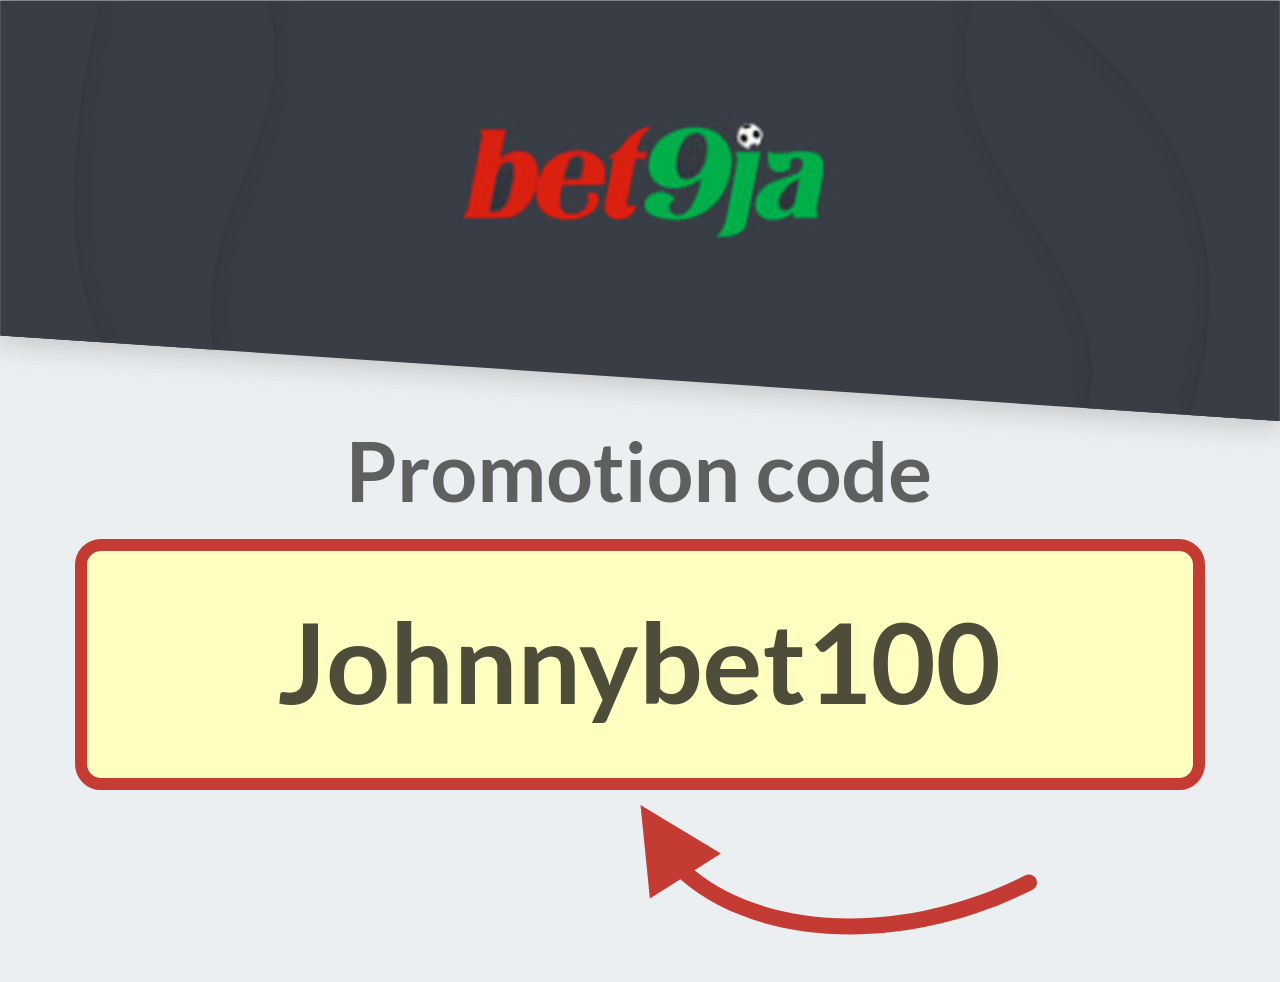 Bet9ja Promotion Code